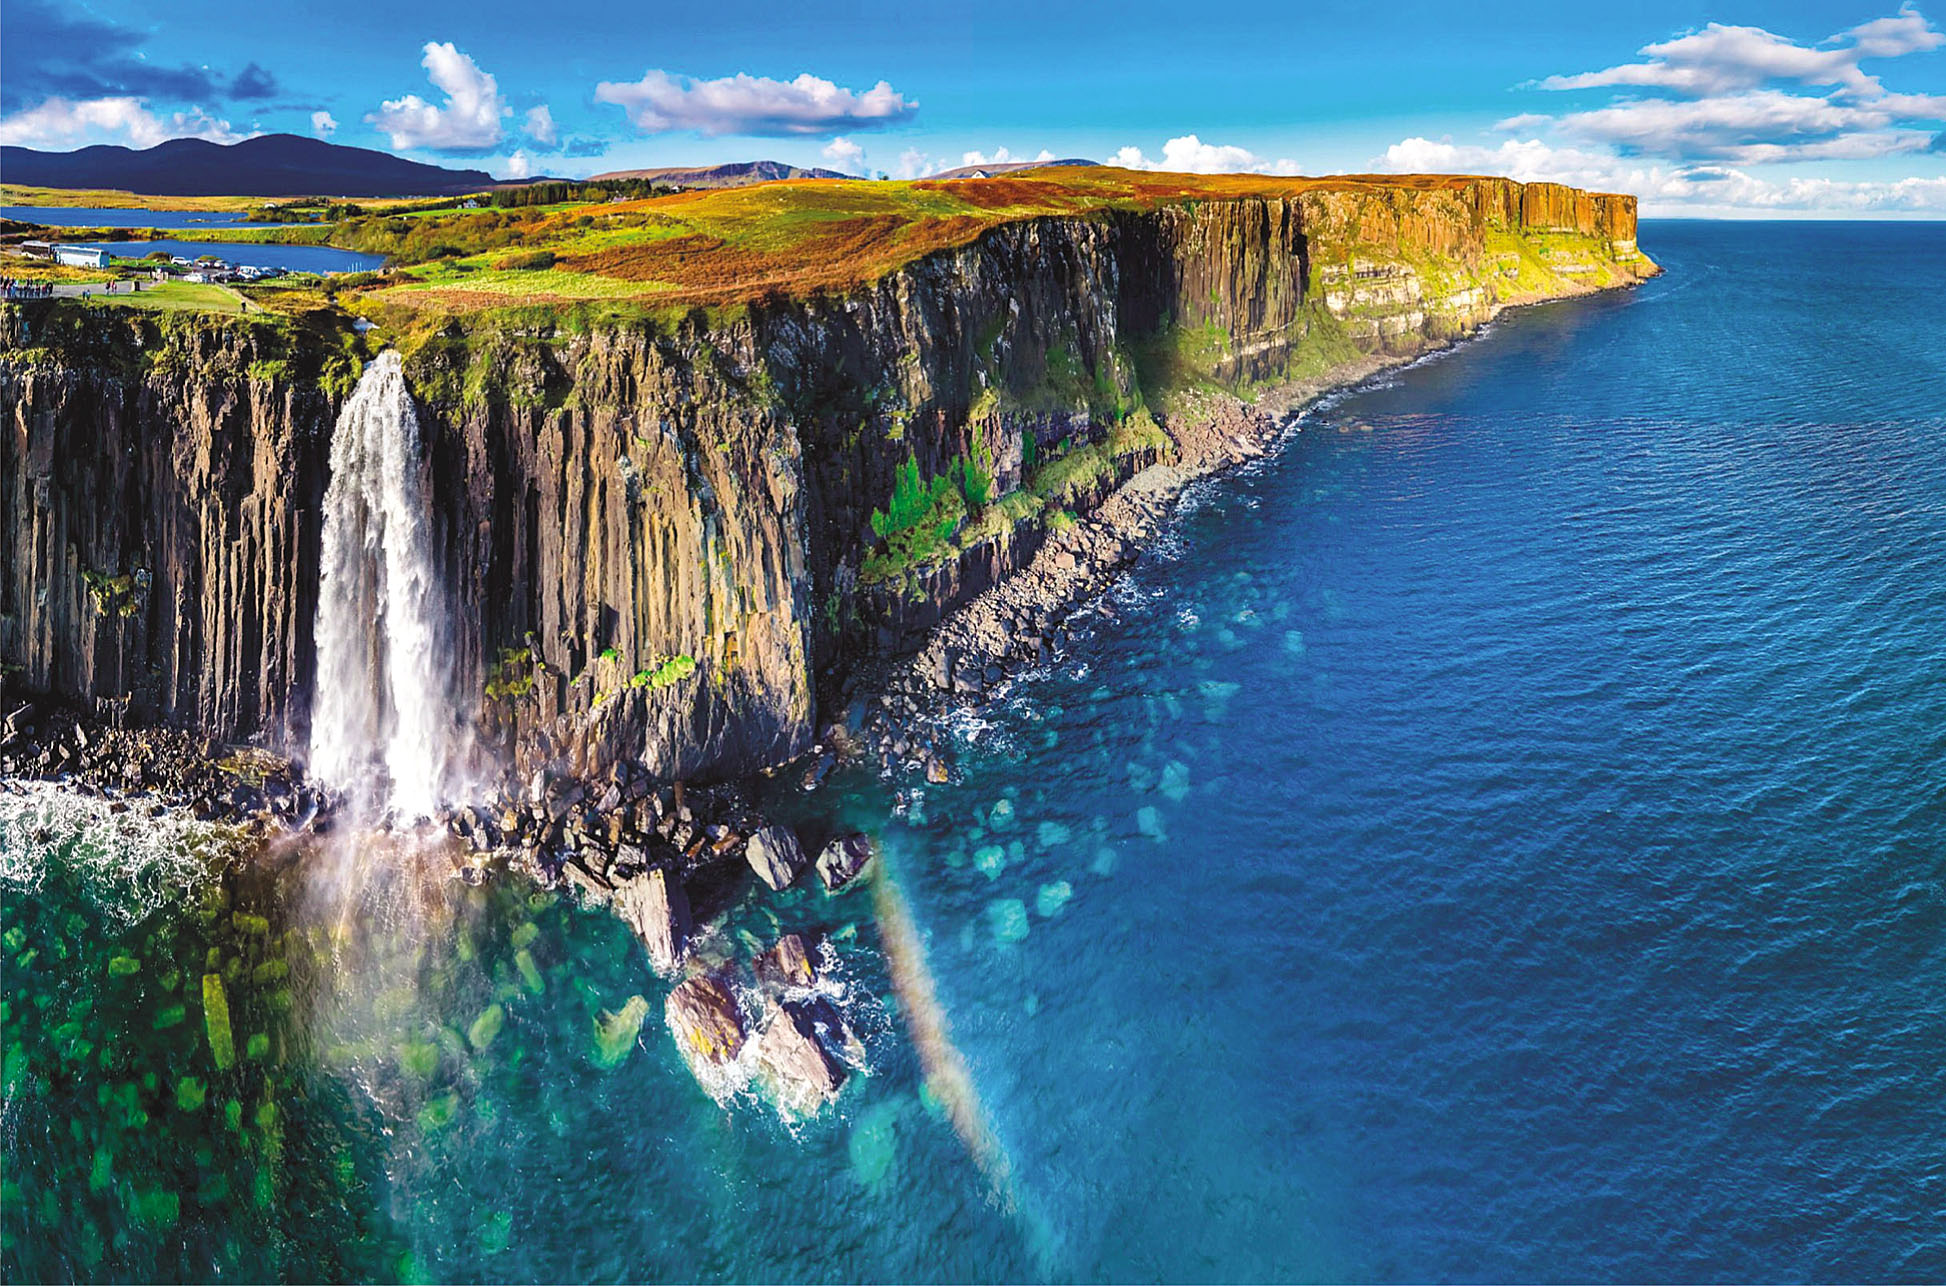 Trotternish Peninsula, Isle of Skye, Scotland by Lukas Sek.jpg